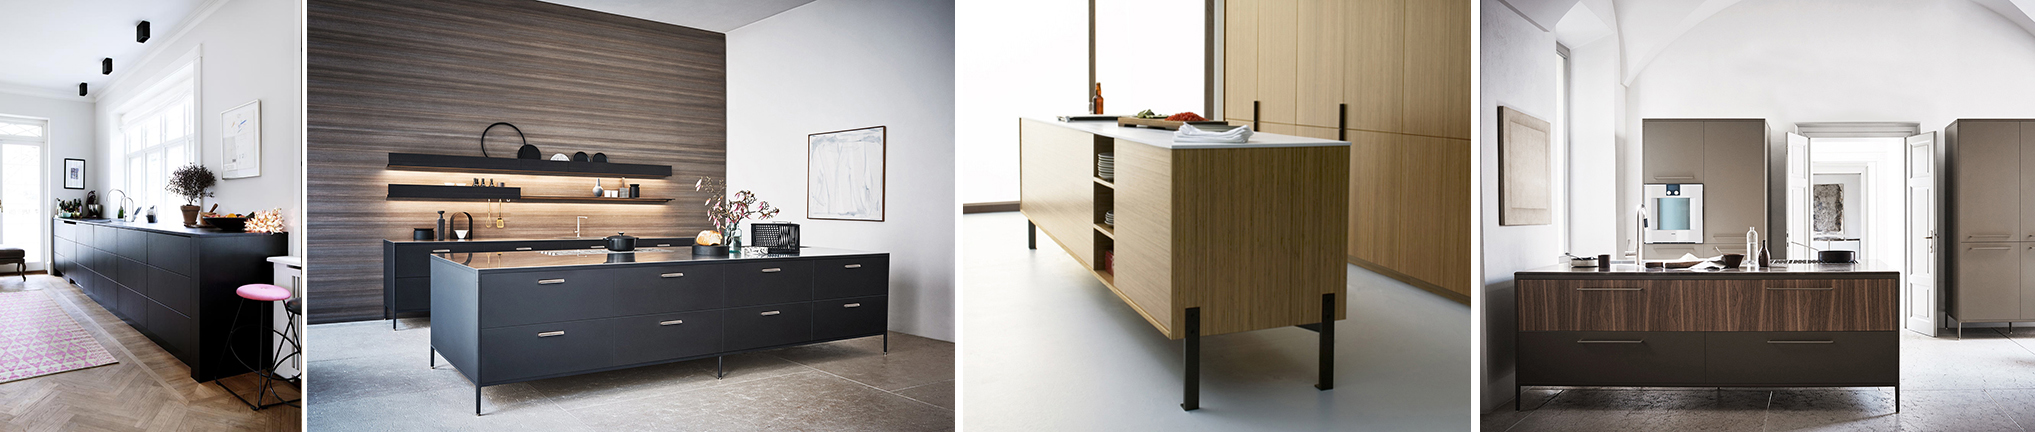 Source/designers: Camilla Miehe Renard; Cesar; Henry Built; Cesar